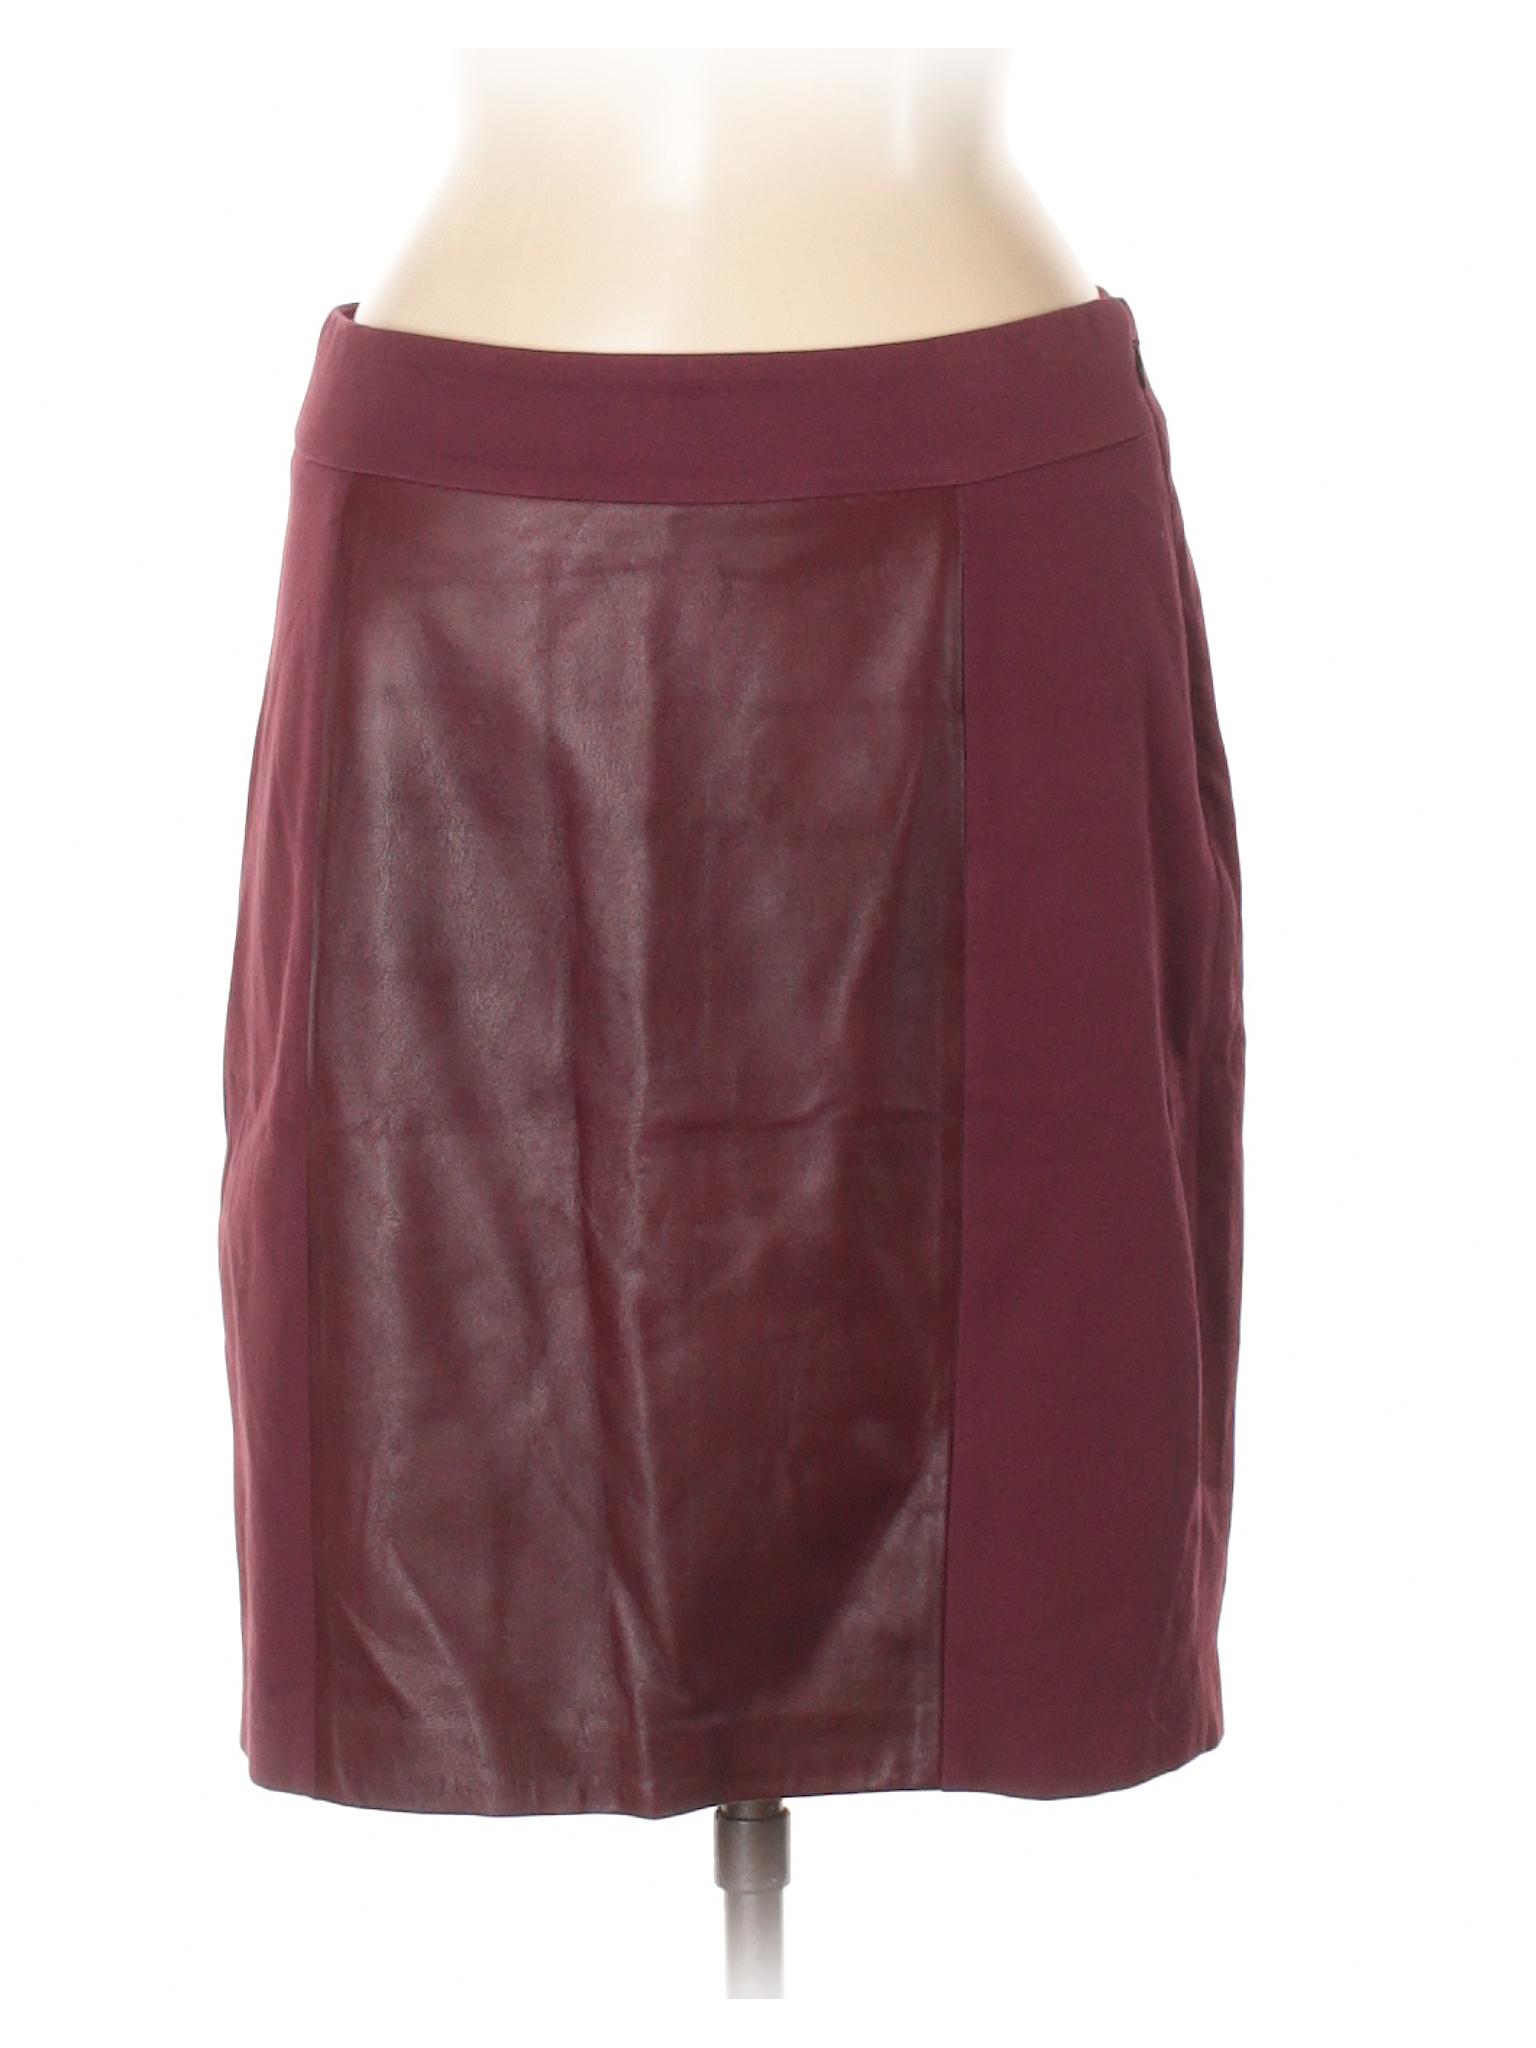 Leather Boutique Republic Banana Boutique Banana Skirt SIqF5x1xnw